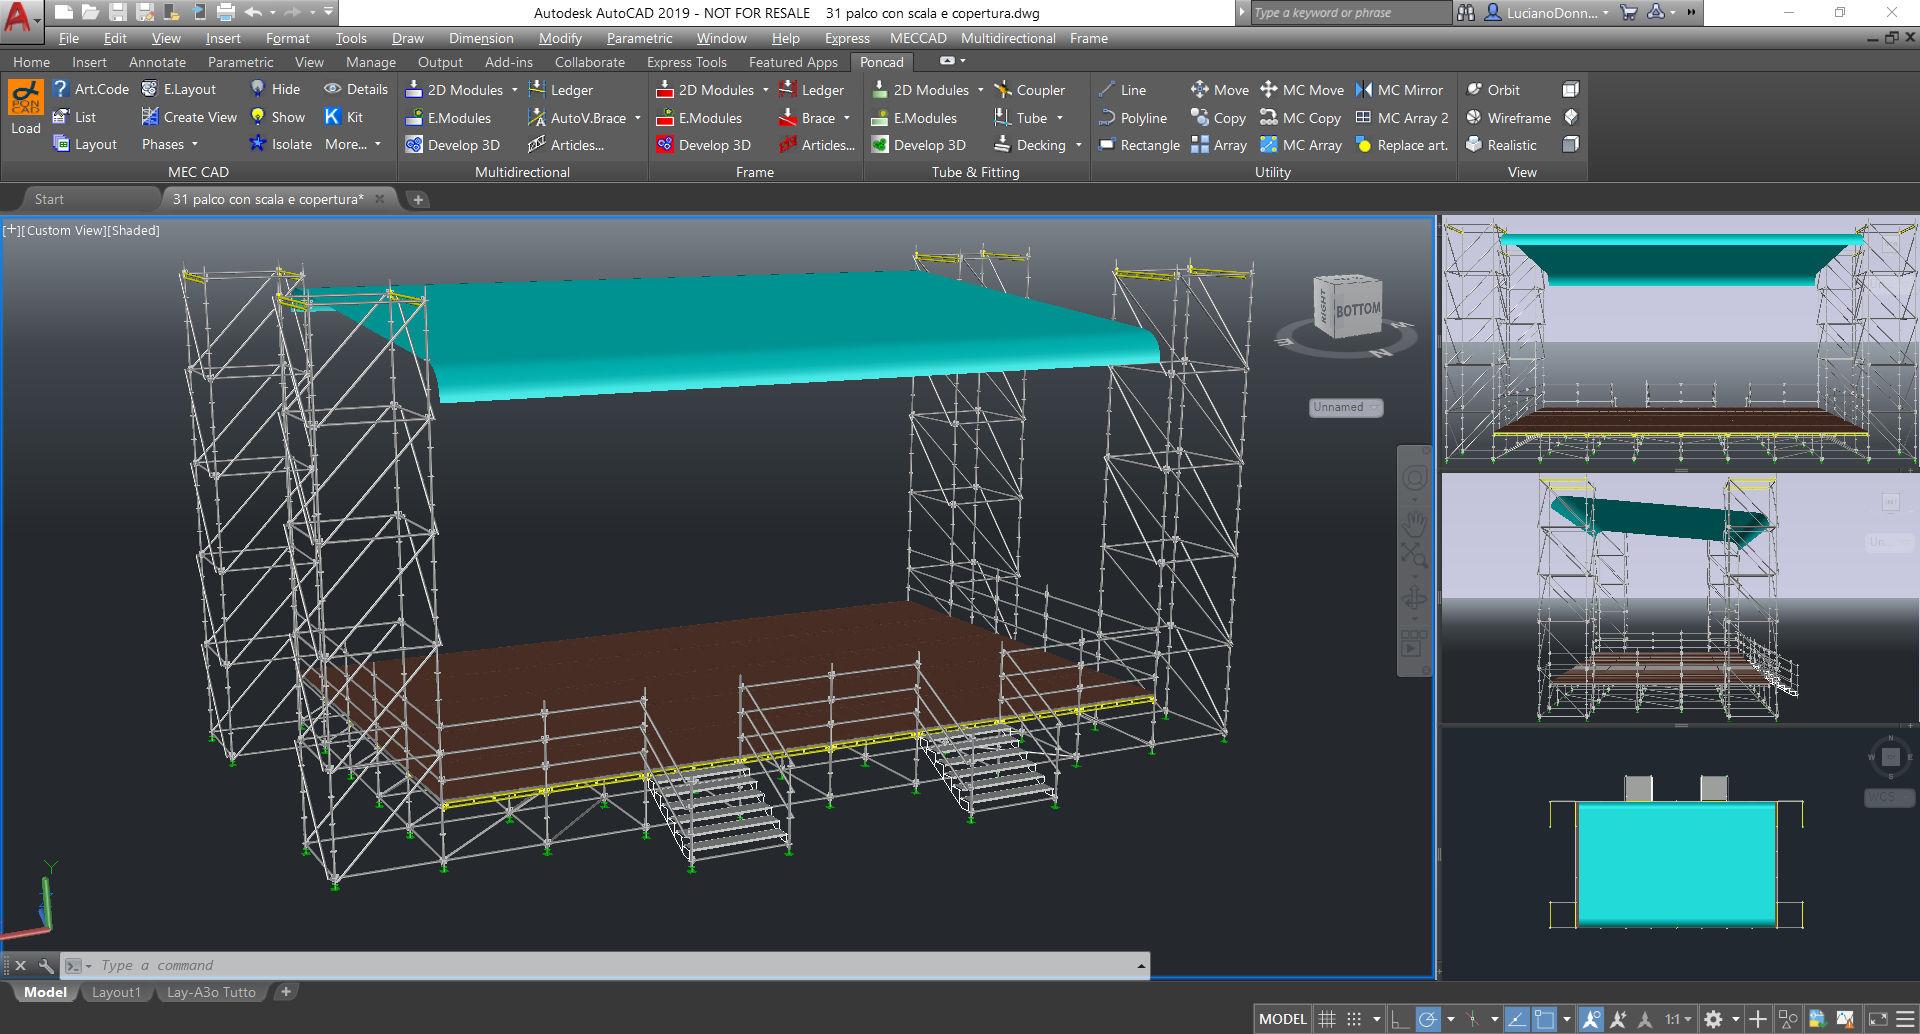 Programmi per palchi tribune coperture torri regia for Programmi rendering 3d